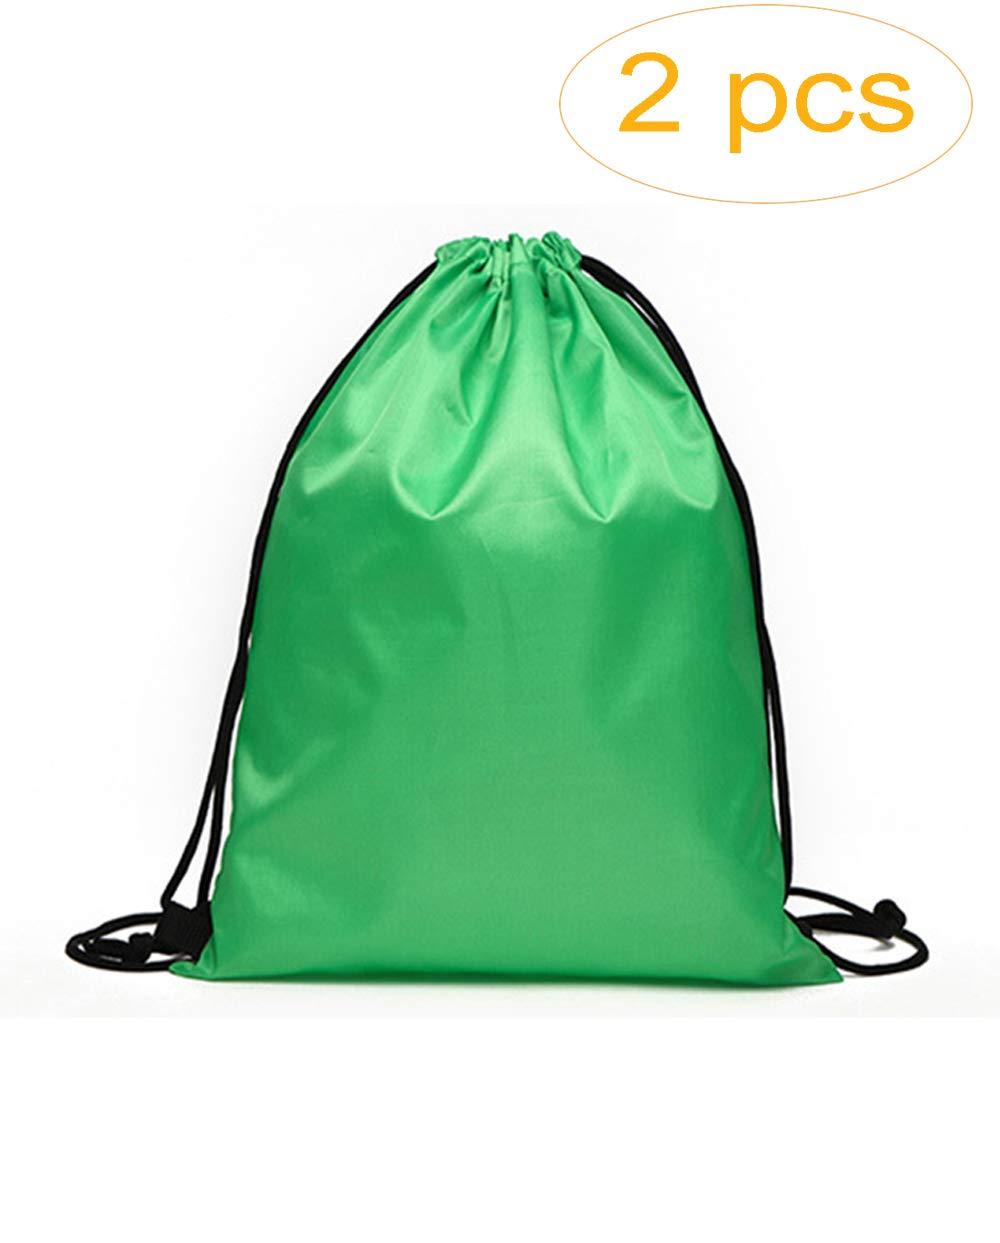 MepLife Waterproof Foldable Drawstring Tote Backpack Bags Bulk,Reusable Grocery Bag,Promotional Favor Bags, Budget Bag,Cinch Sack Back Pack String Bag for Sundries Storage Organizer (2 Green)